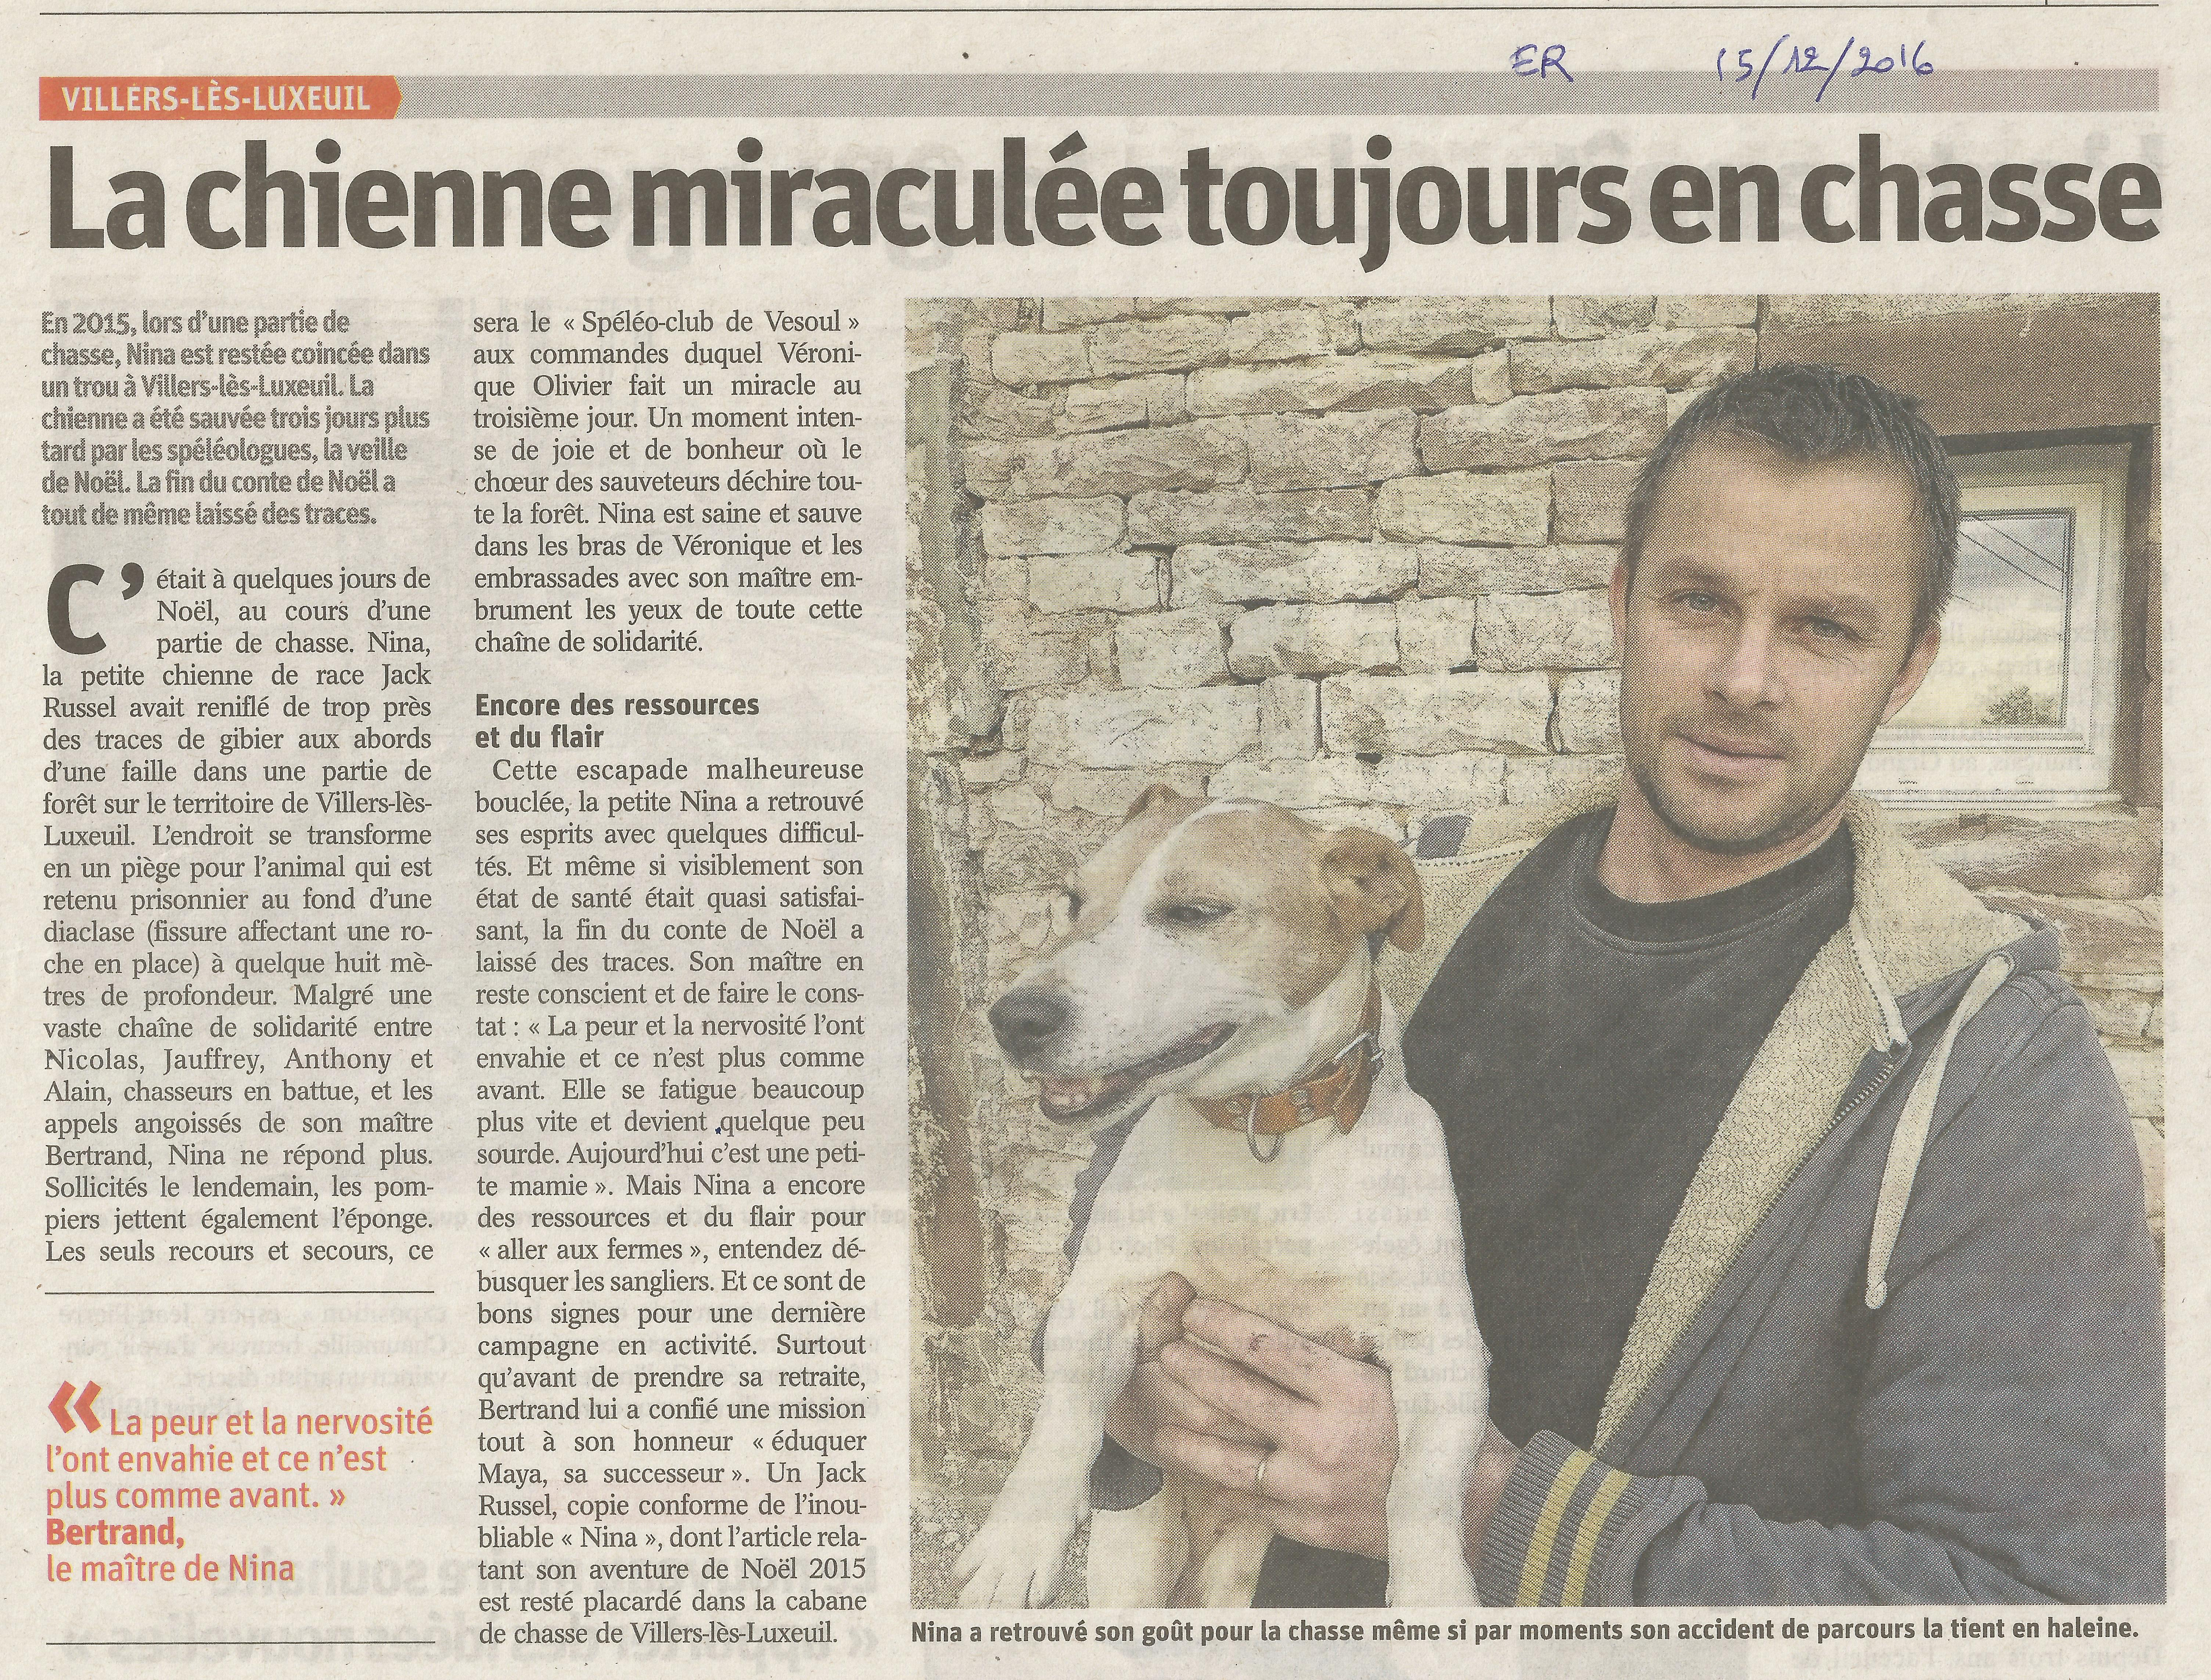 https://www.villers-les-luxeuil.com/projets/villers/files/images/2016_Mairie/Presse/2016_12_15.jpg